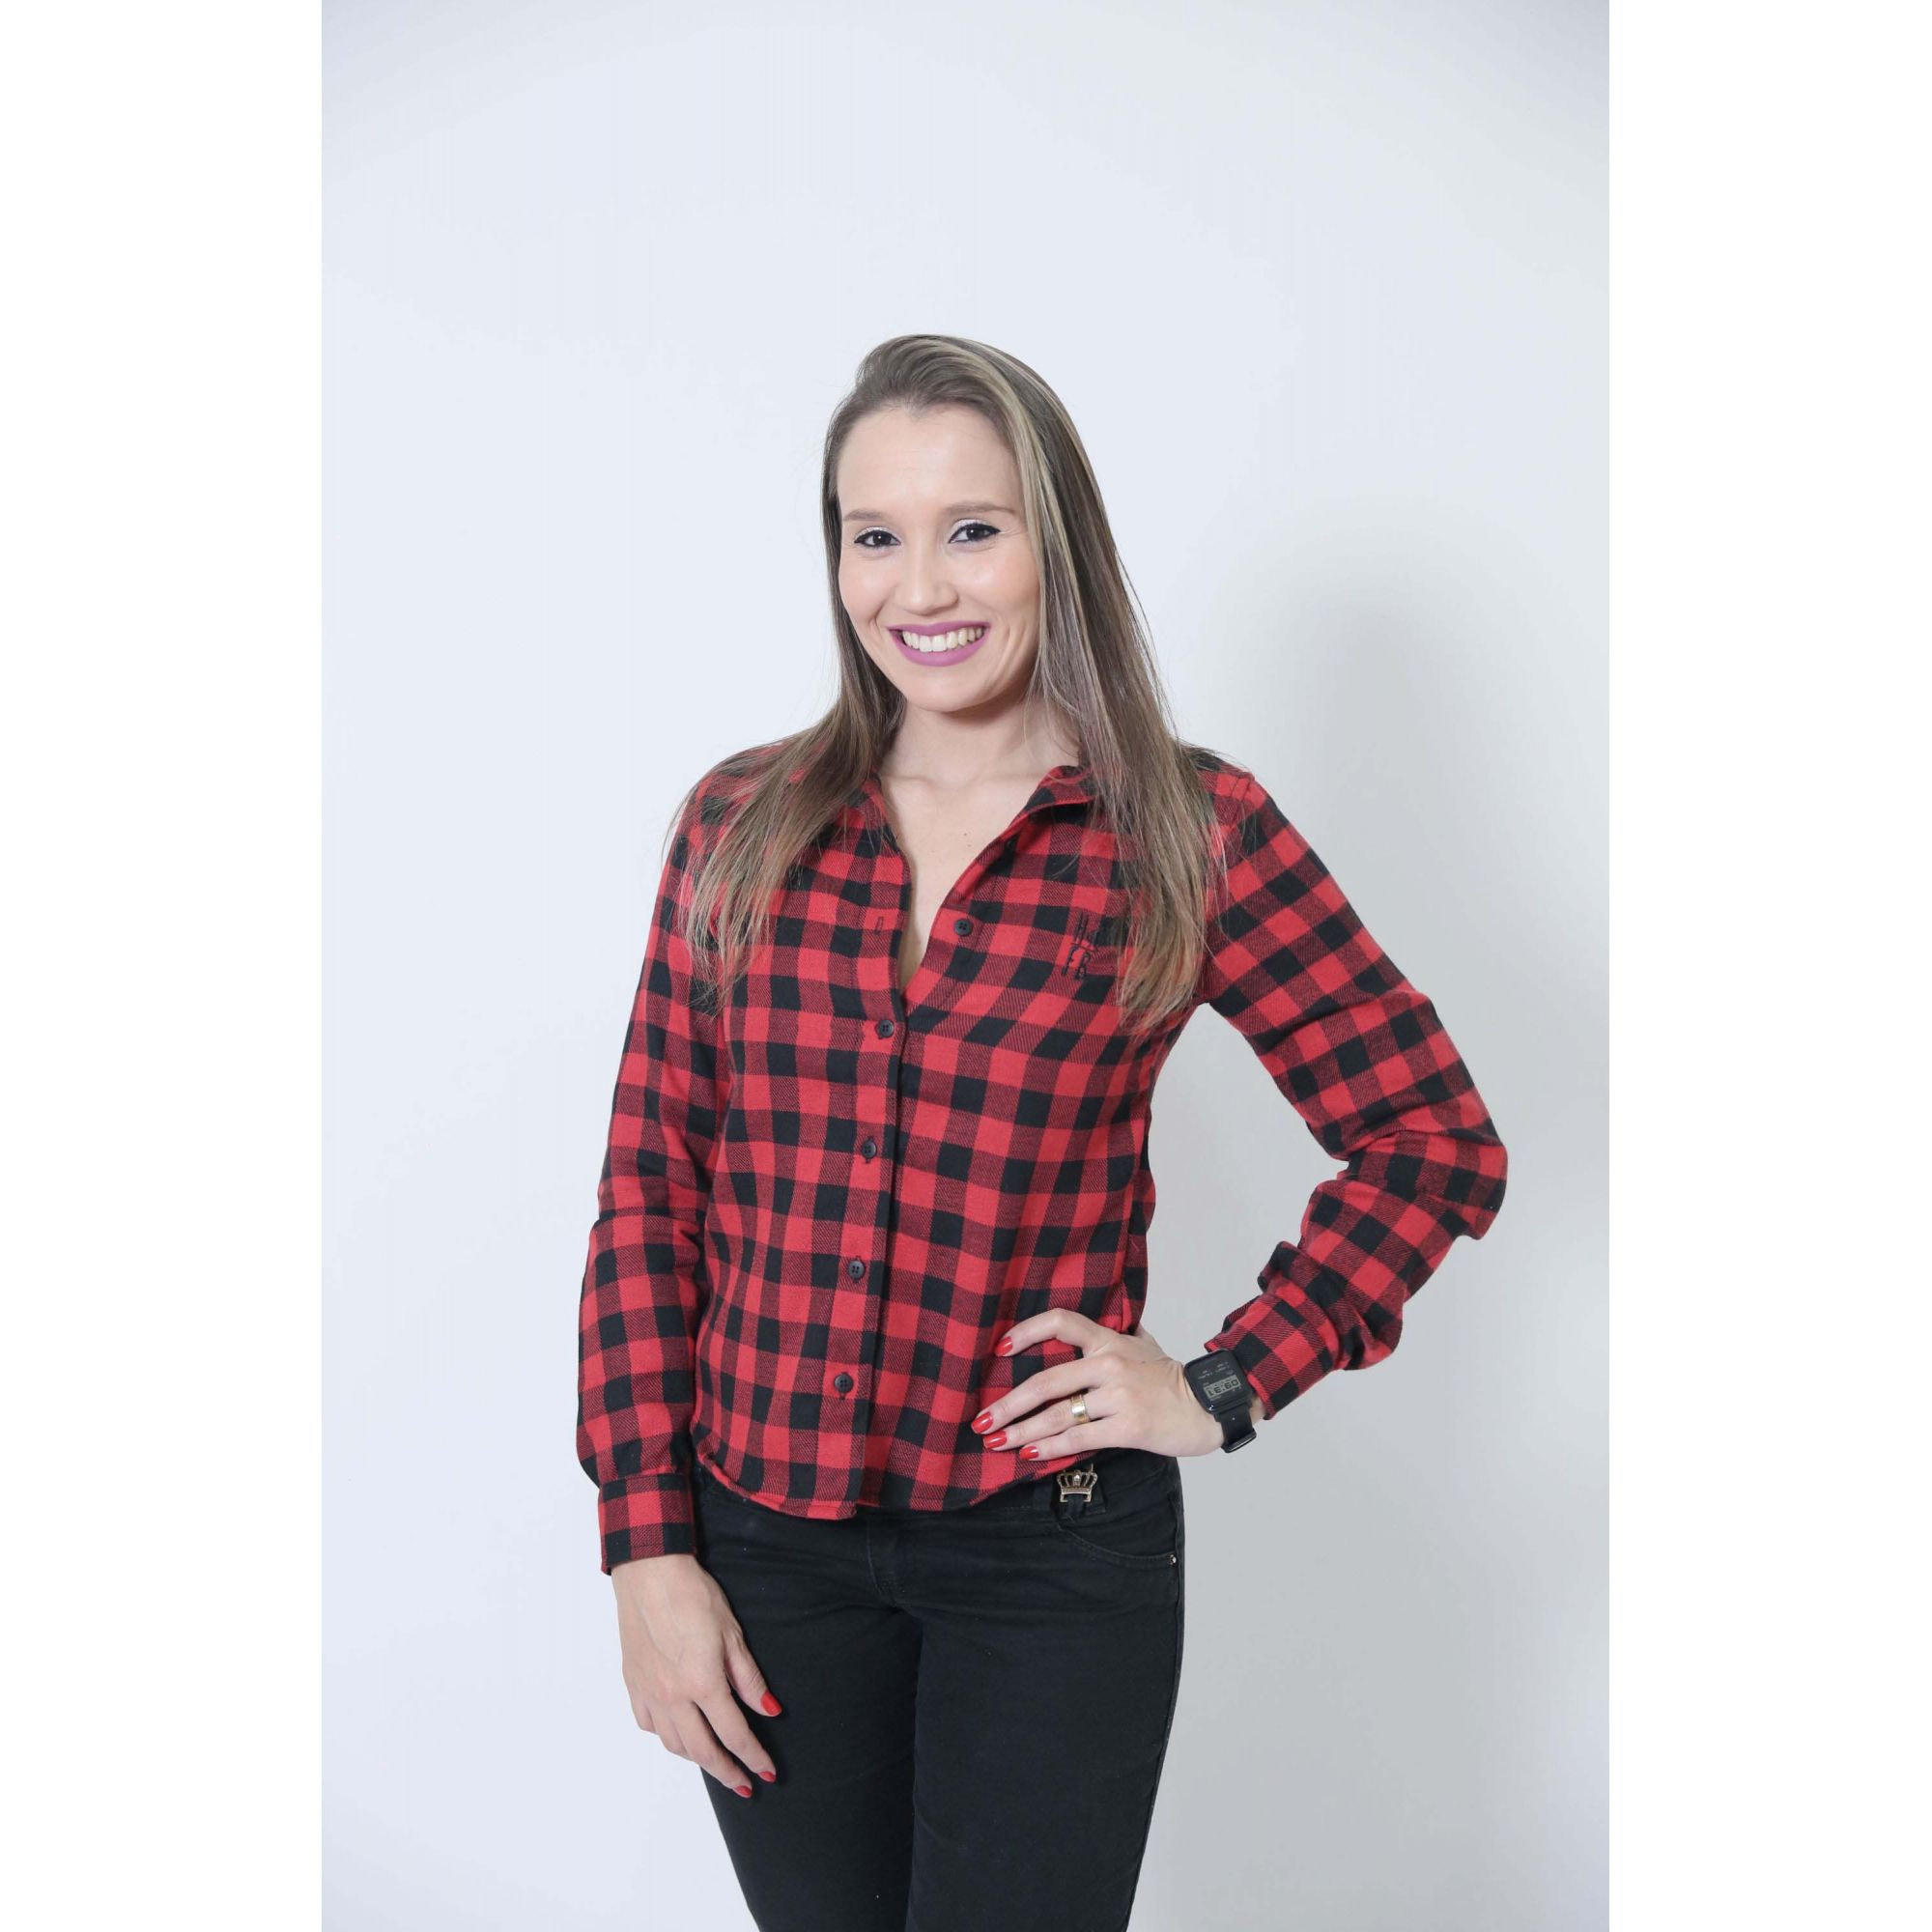 MÃE E FILHO > Kit 02 Camisas Social Xadrez Lenhador [Coleção Tal Mãe Tal Filho]  - Heitor Fashion Brazil